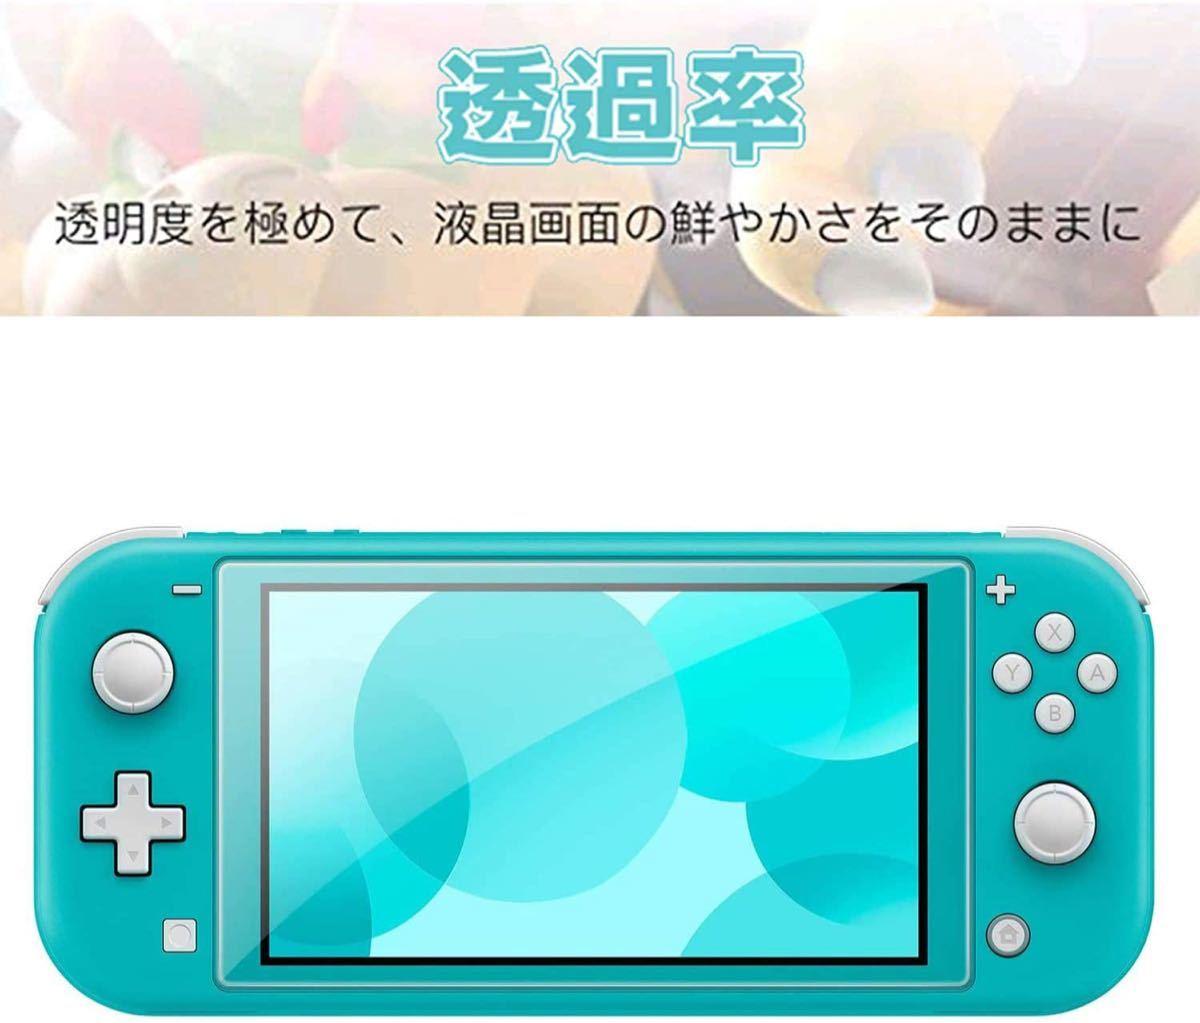 Switch Lite用 ガラスフィルム 保護フィルム 3枚入り 【ブルーライトカット】